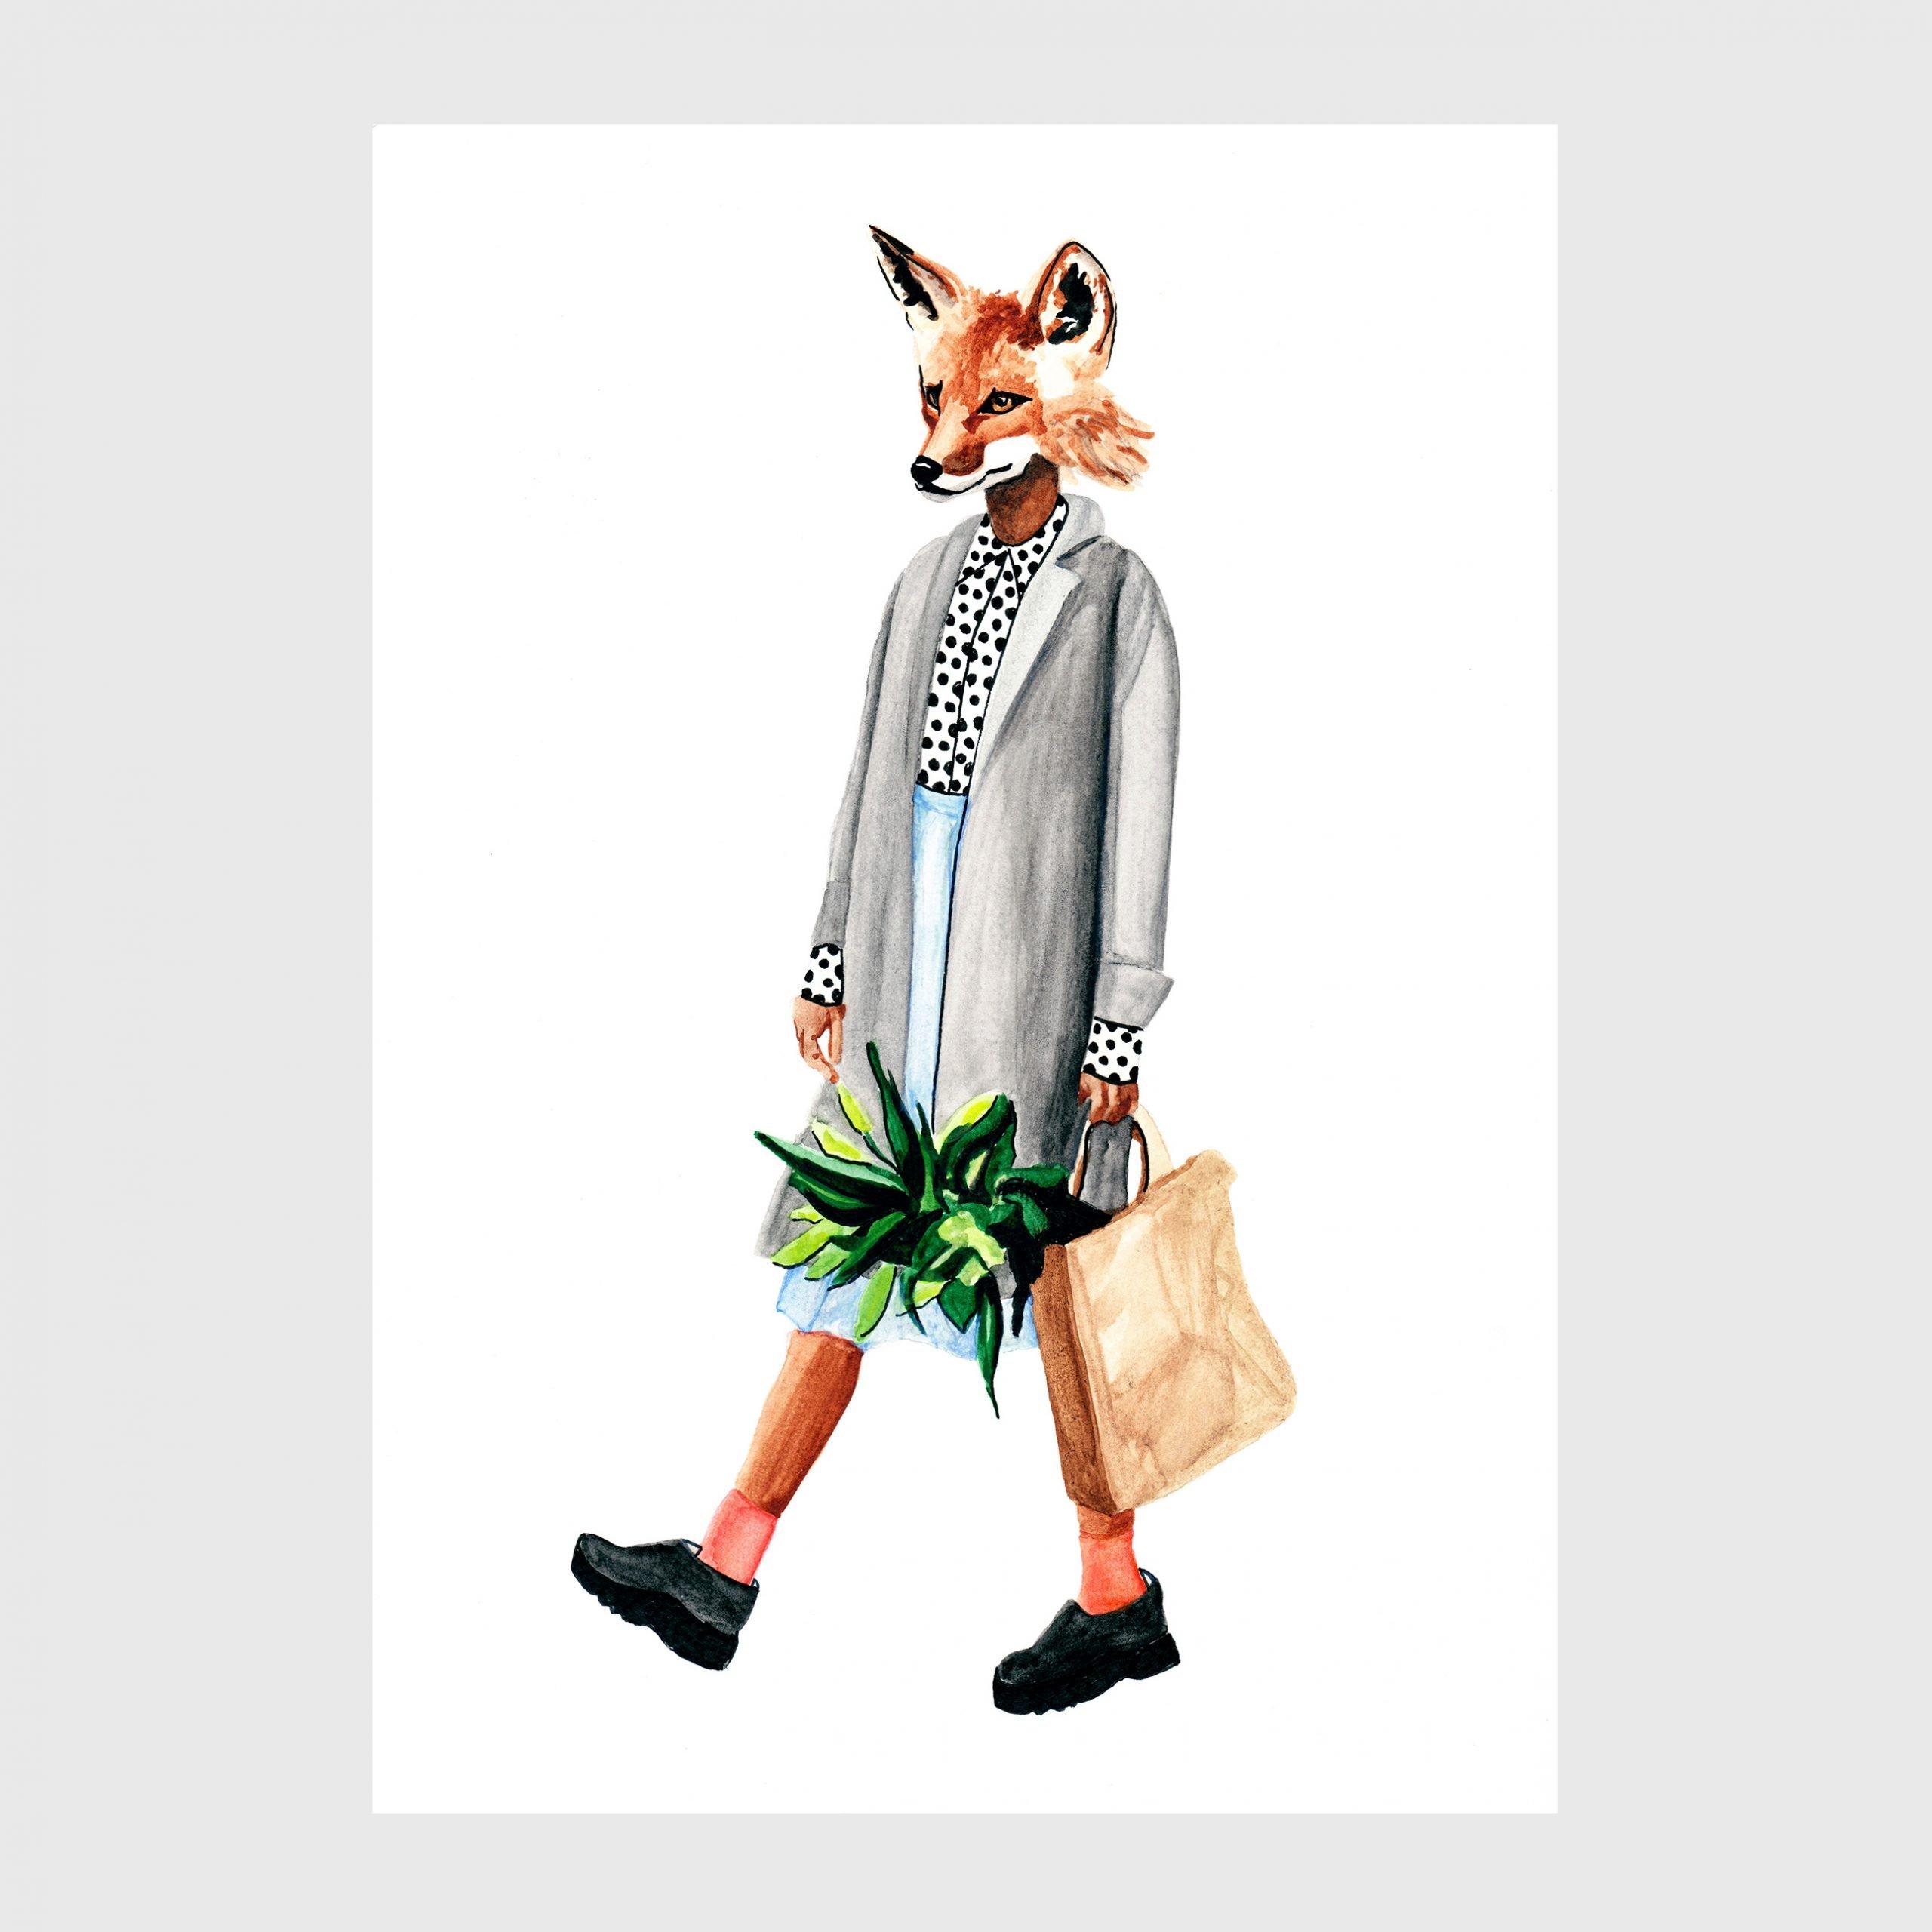 16-karina-krumina fashion design illustration